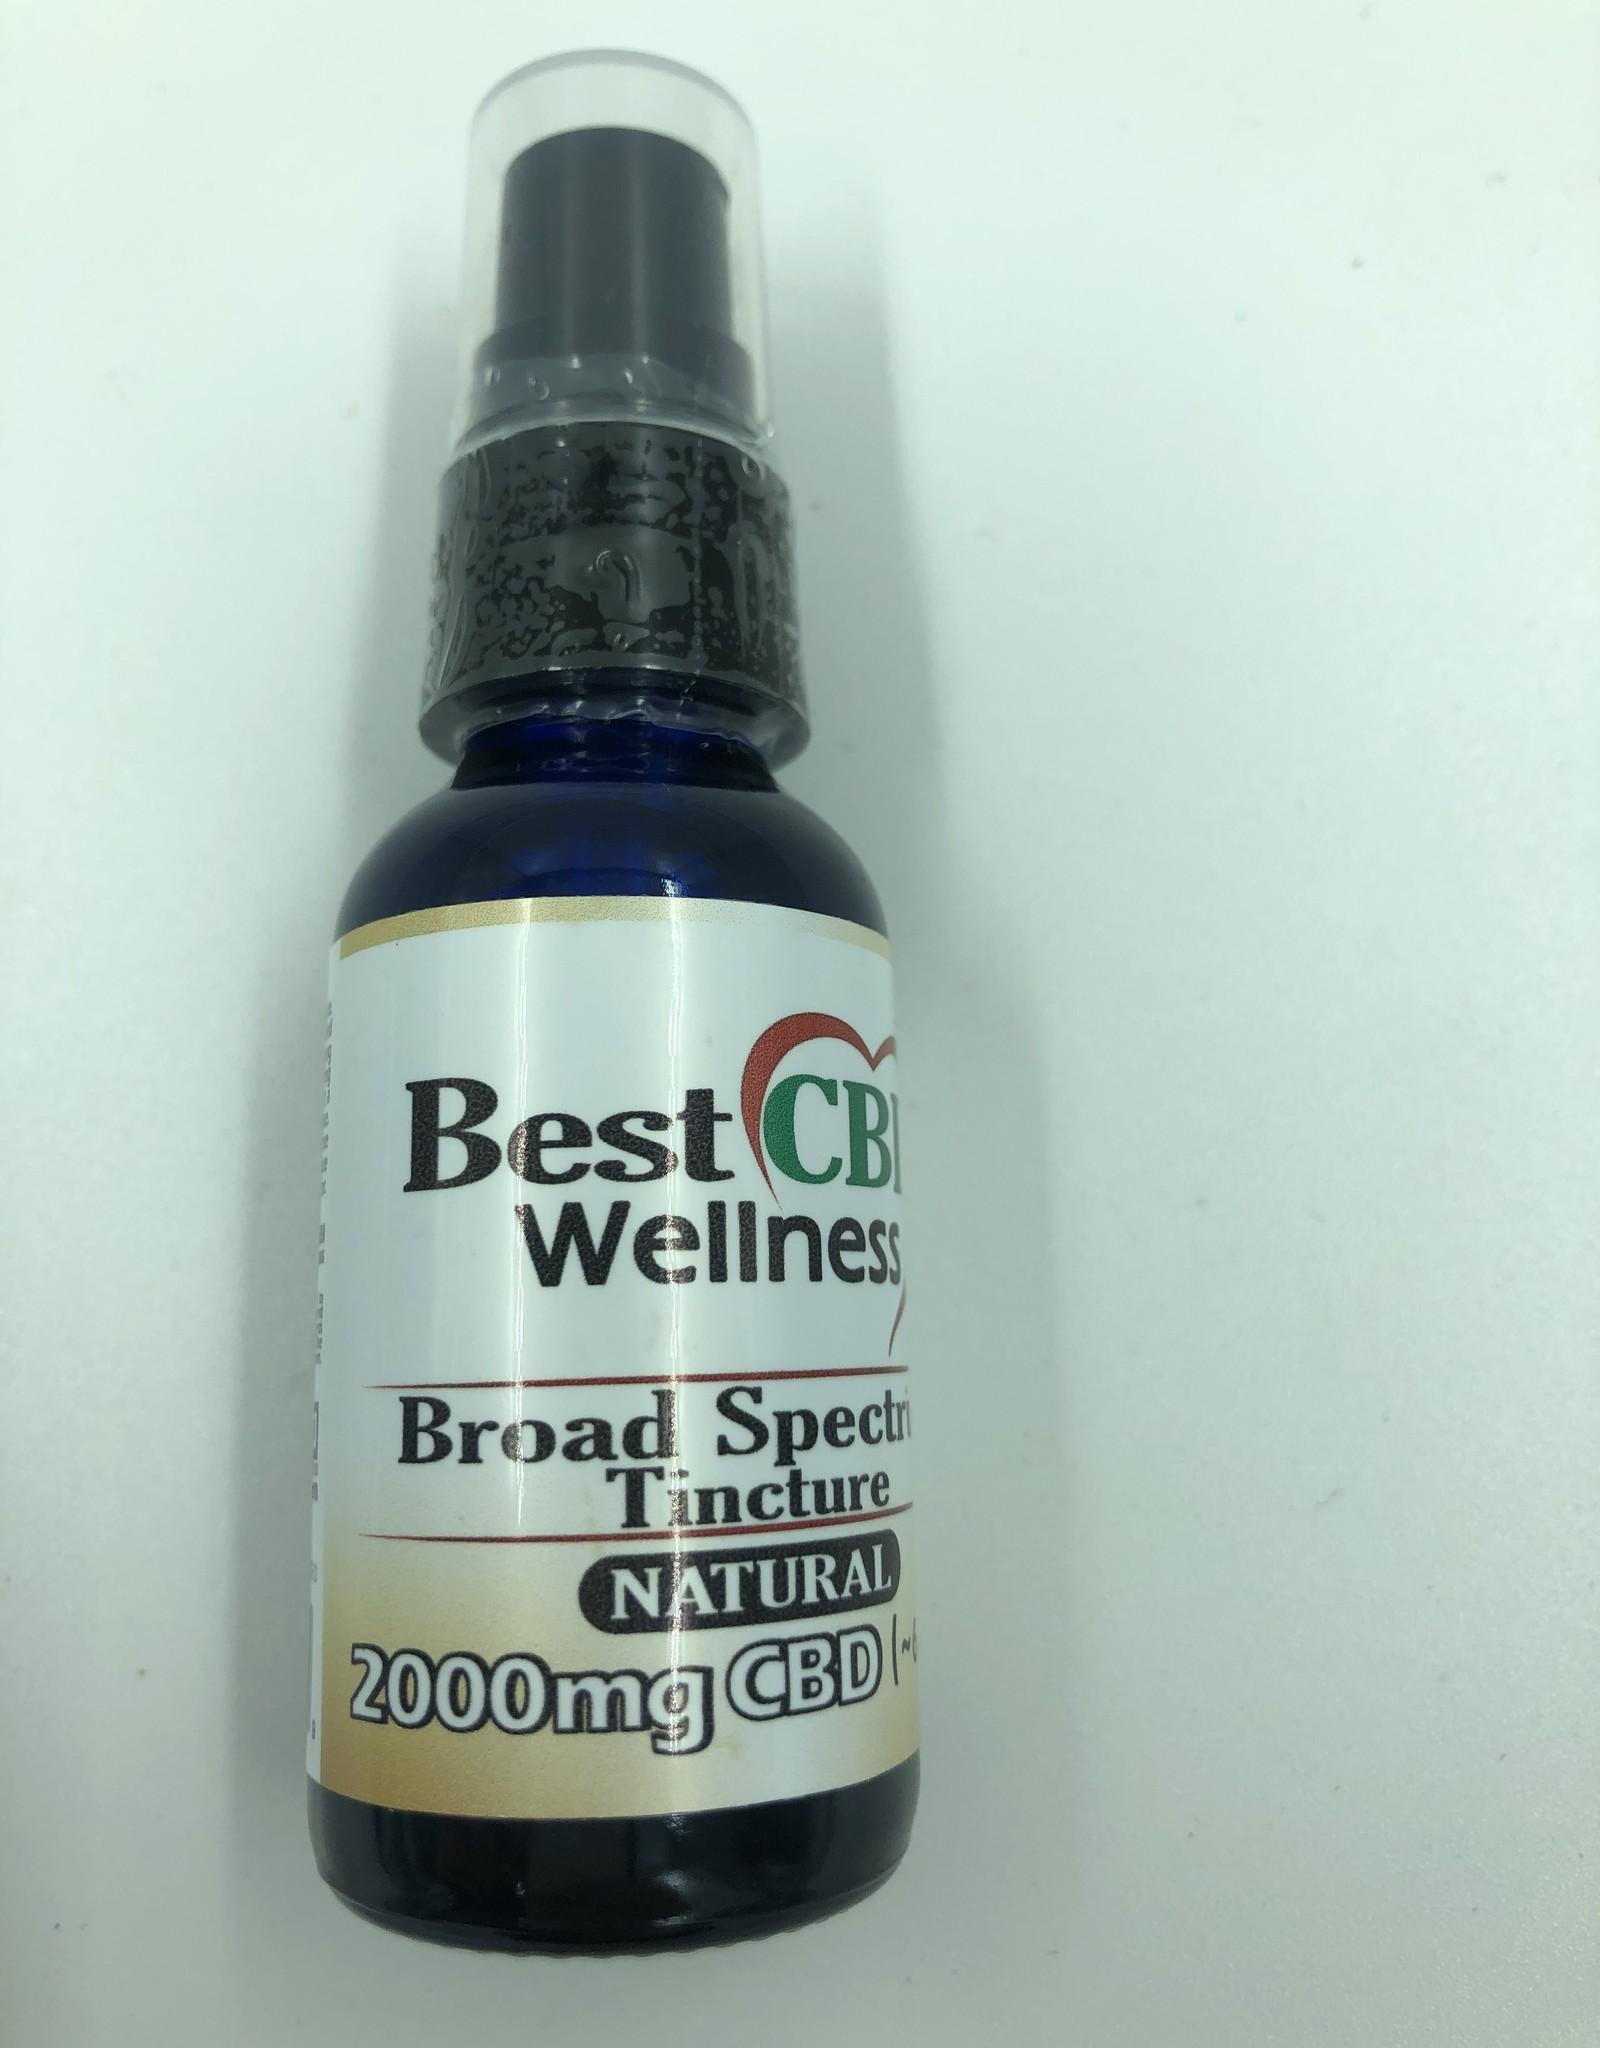 Best CBD Wellness Broad Spectrum CBD Oil Tincture 2000mg Natural